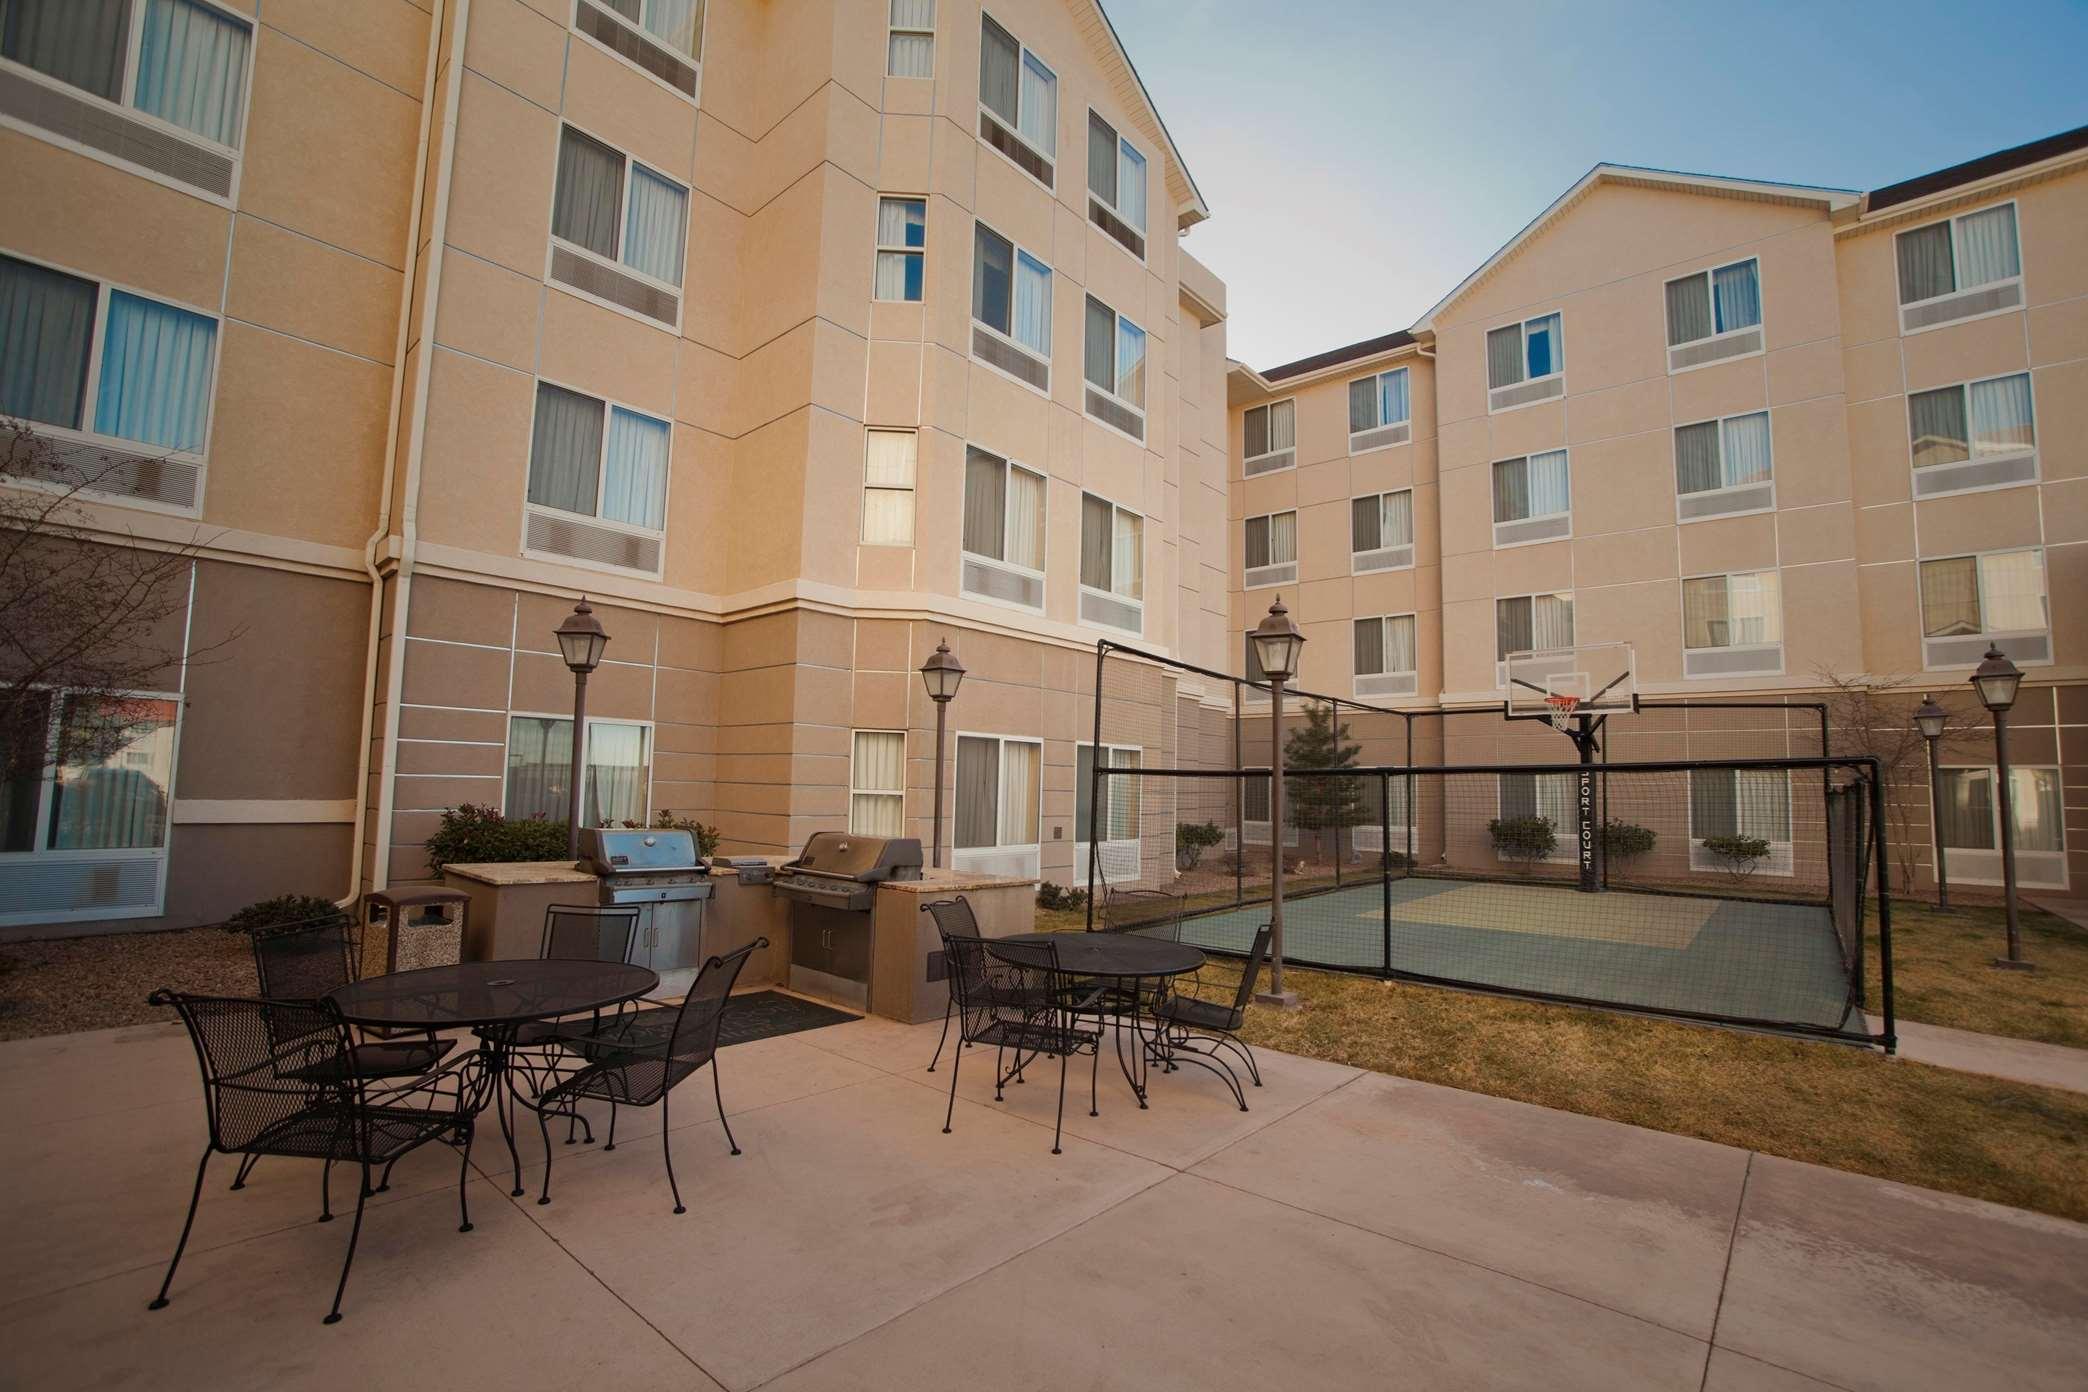 Homewood Suites by Hilton Albuquerque Airport image 19